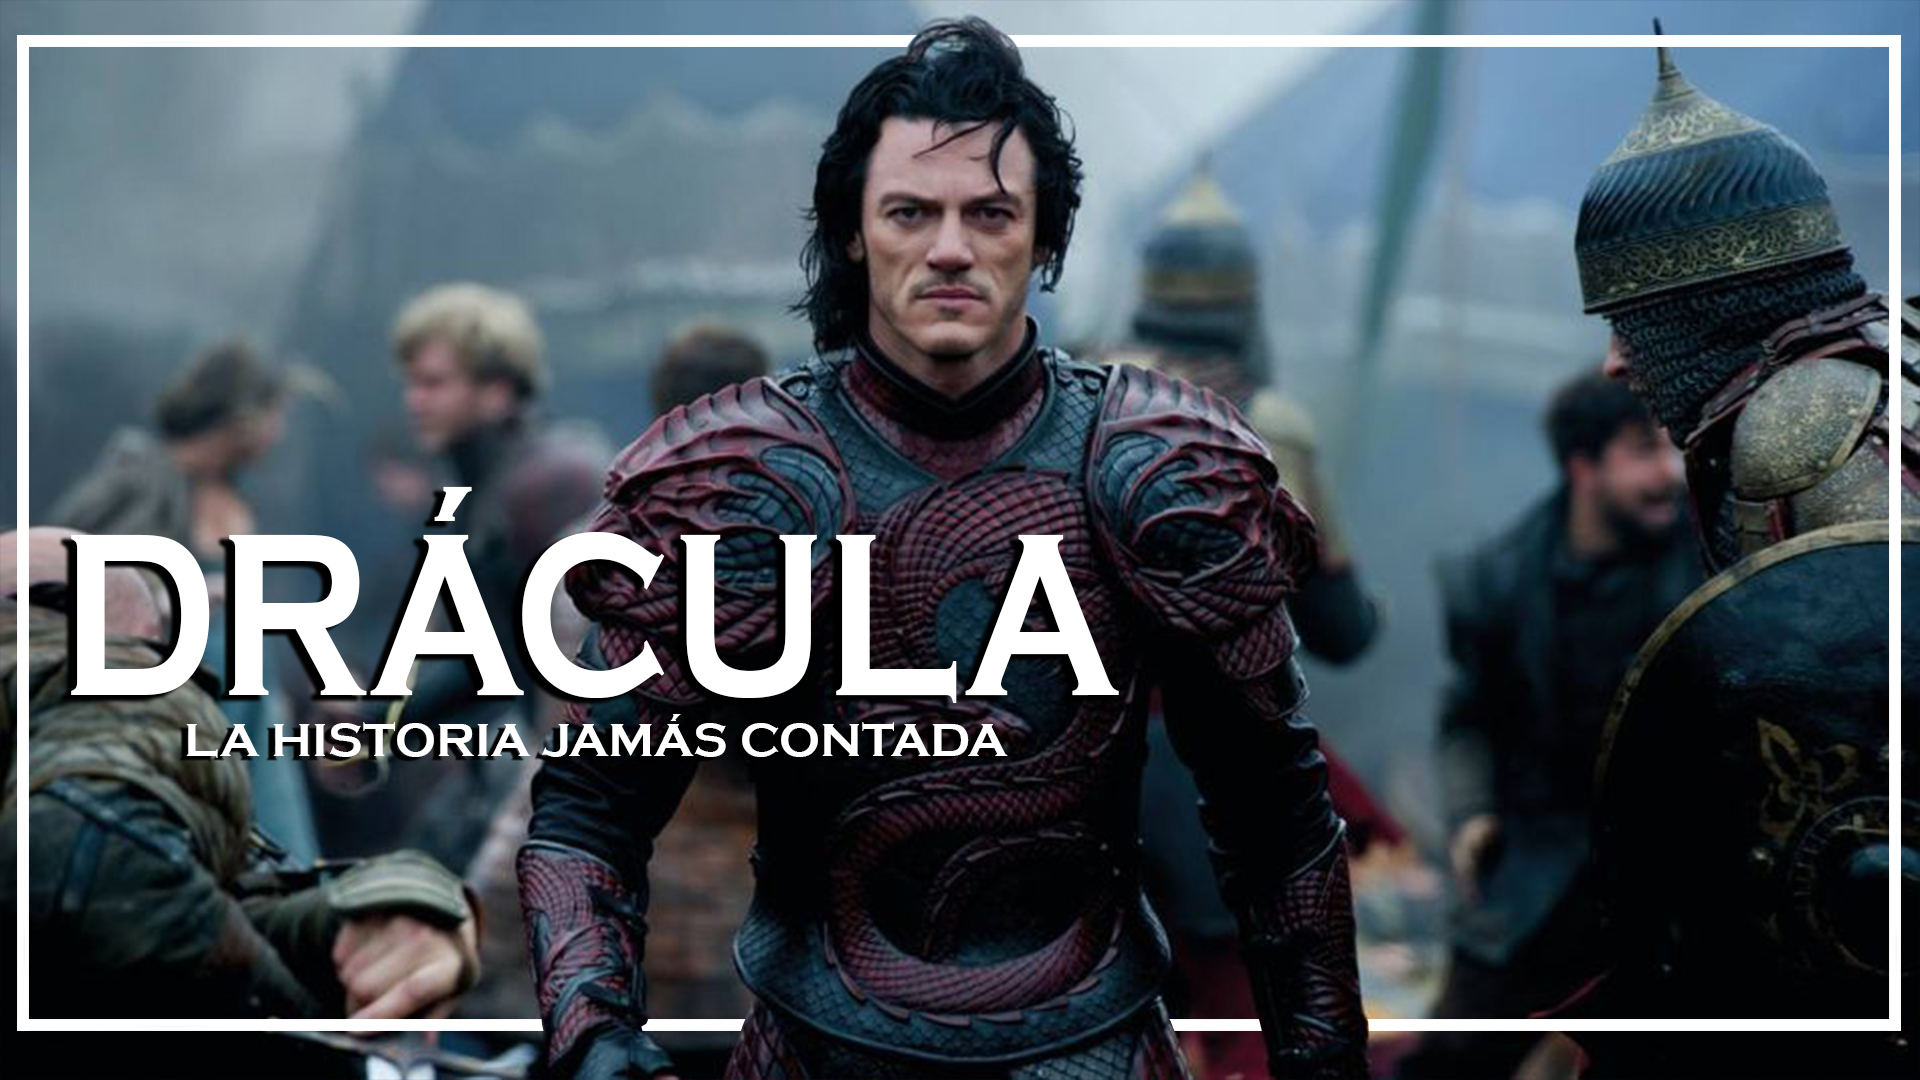 Dracula portada español.jpg